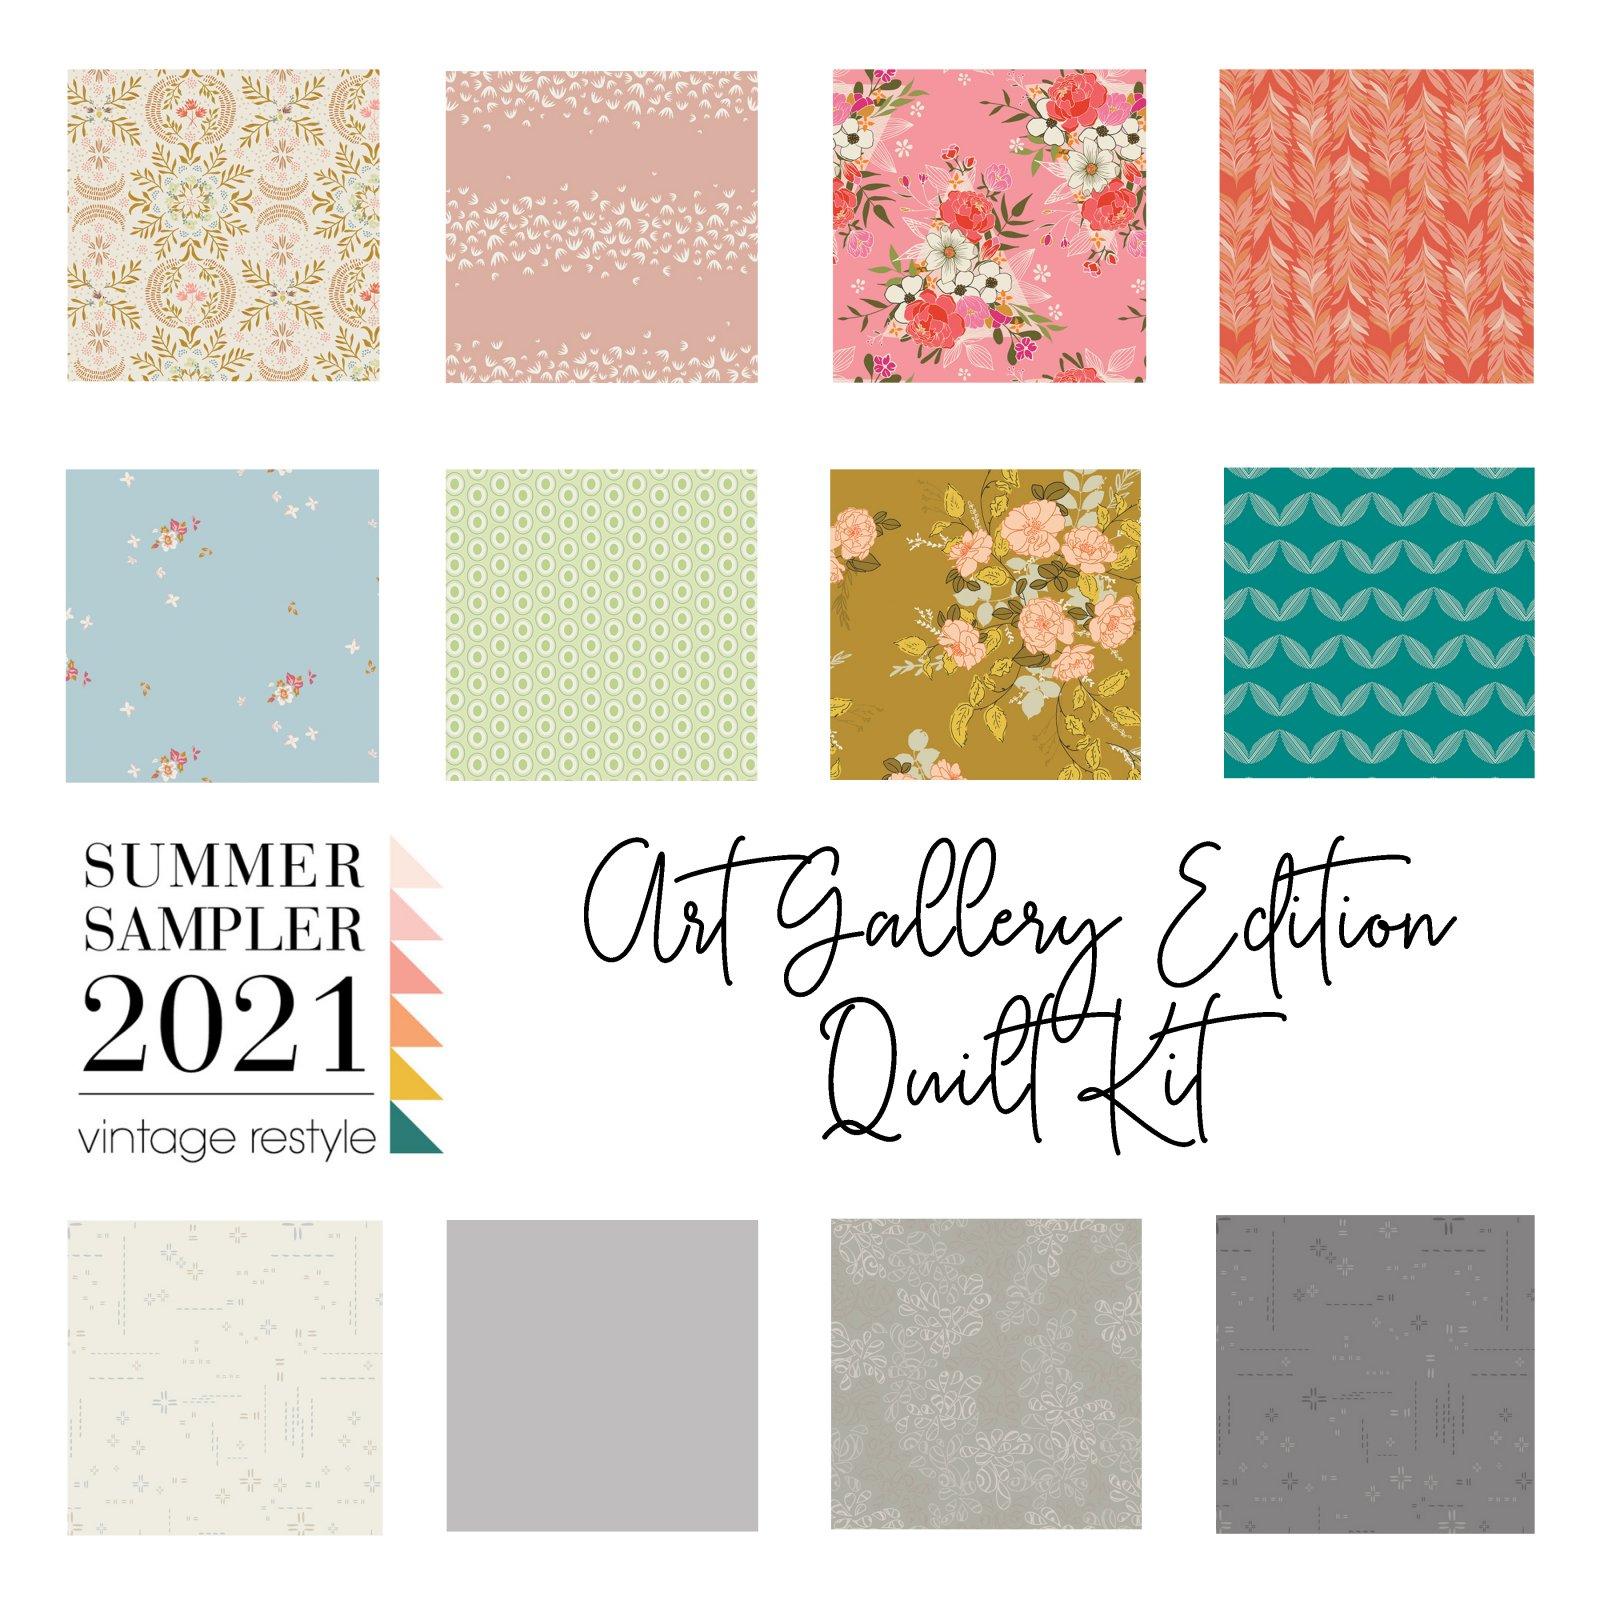 Summer Sampler Quilt Kit - Art Gallery Edition - Fabric Only Kit